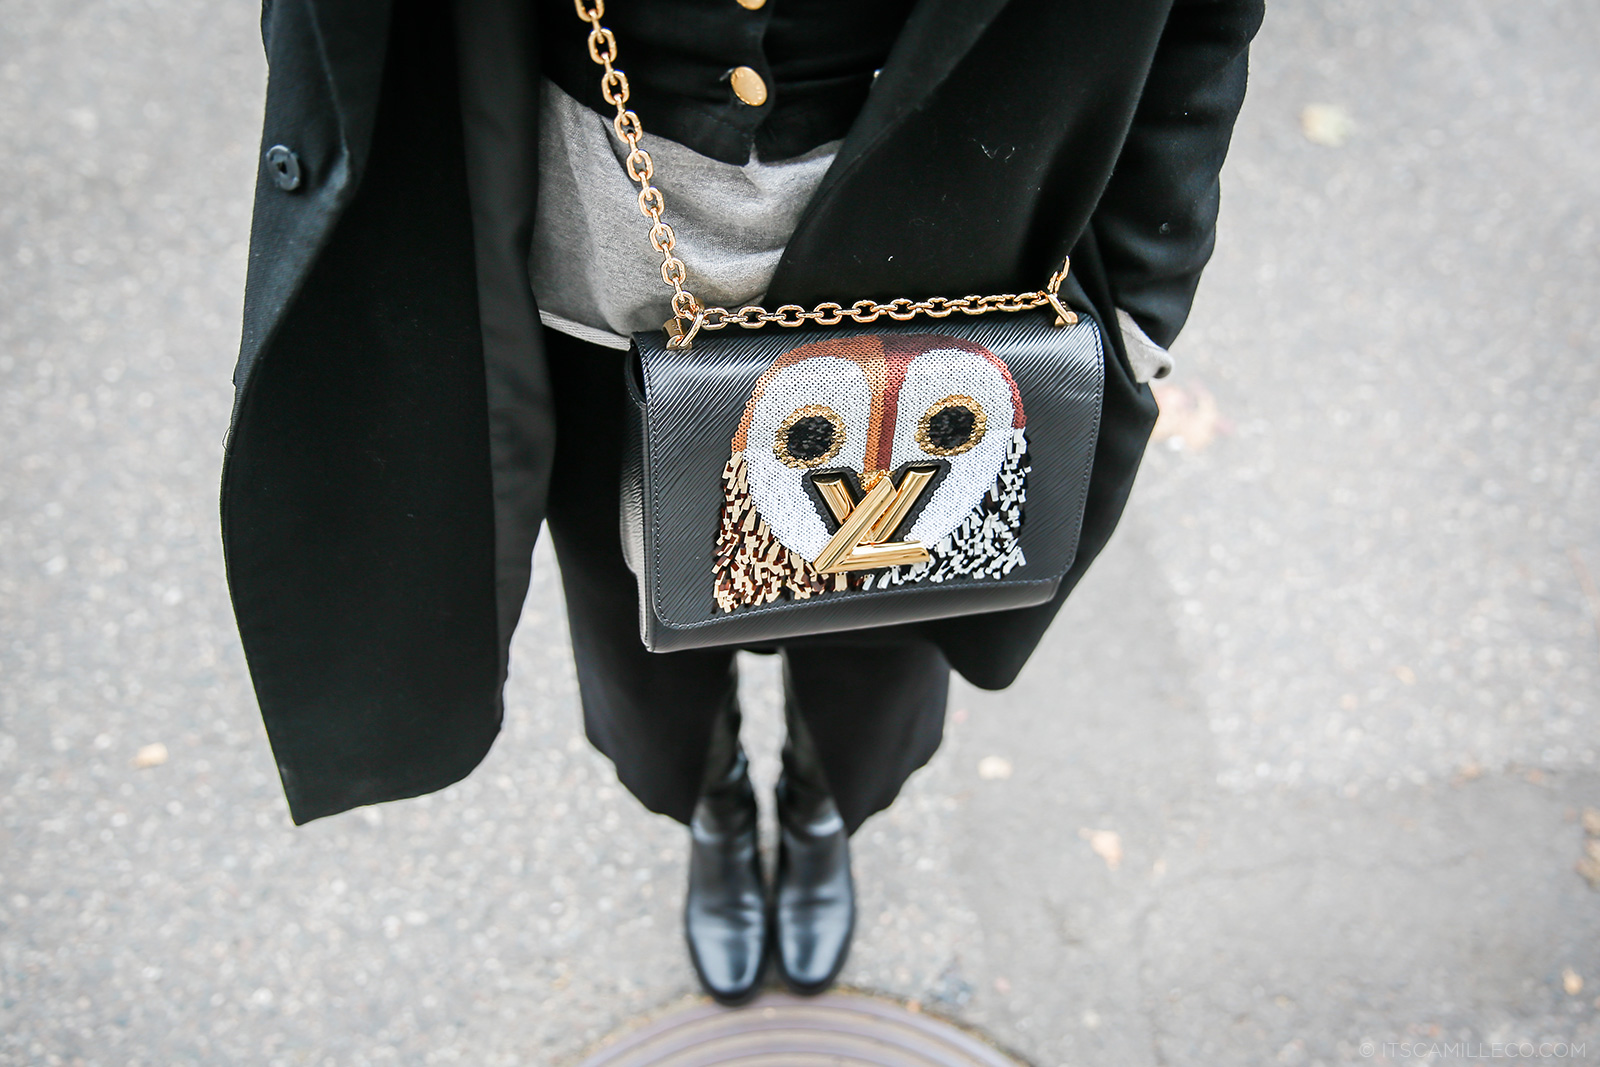 Louis Vuitton Twist Bag - www.itscamilleco.com